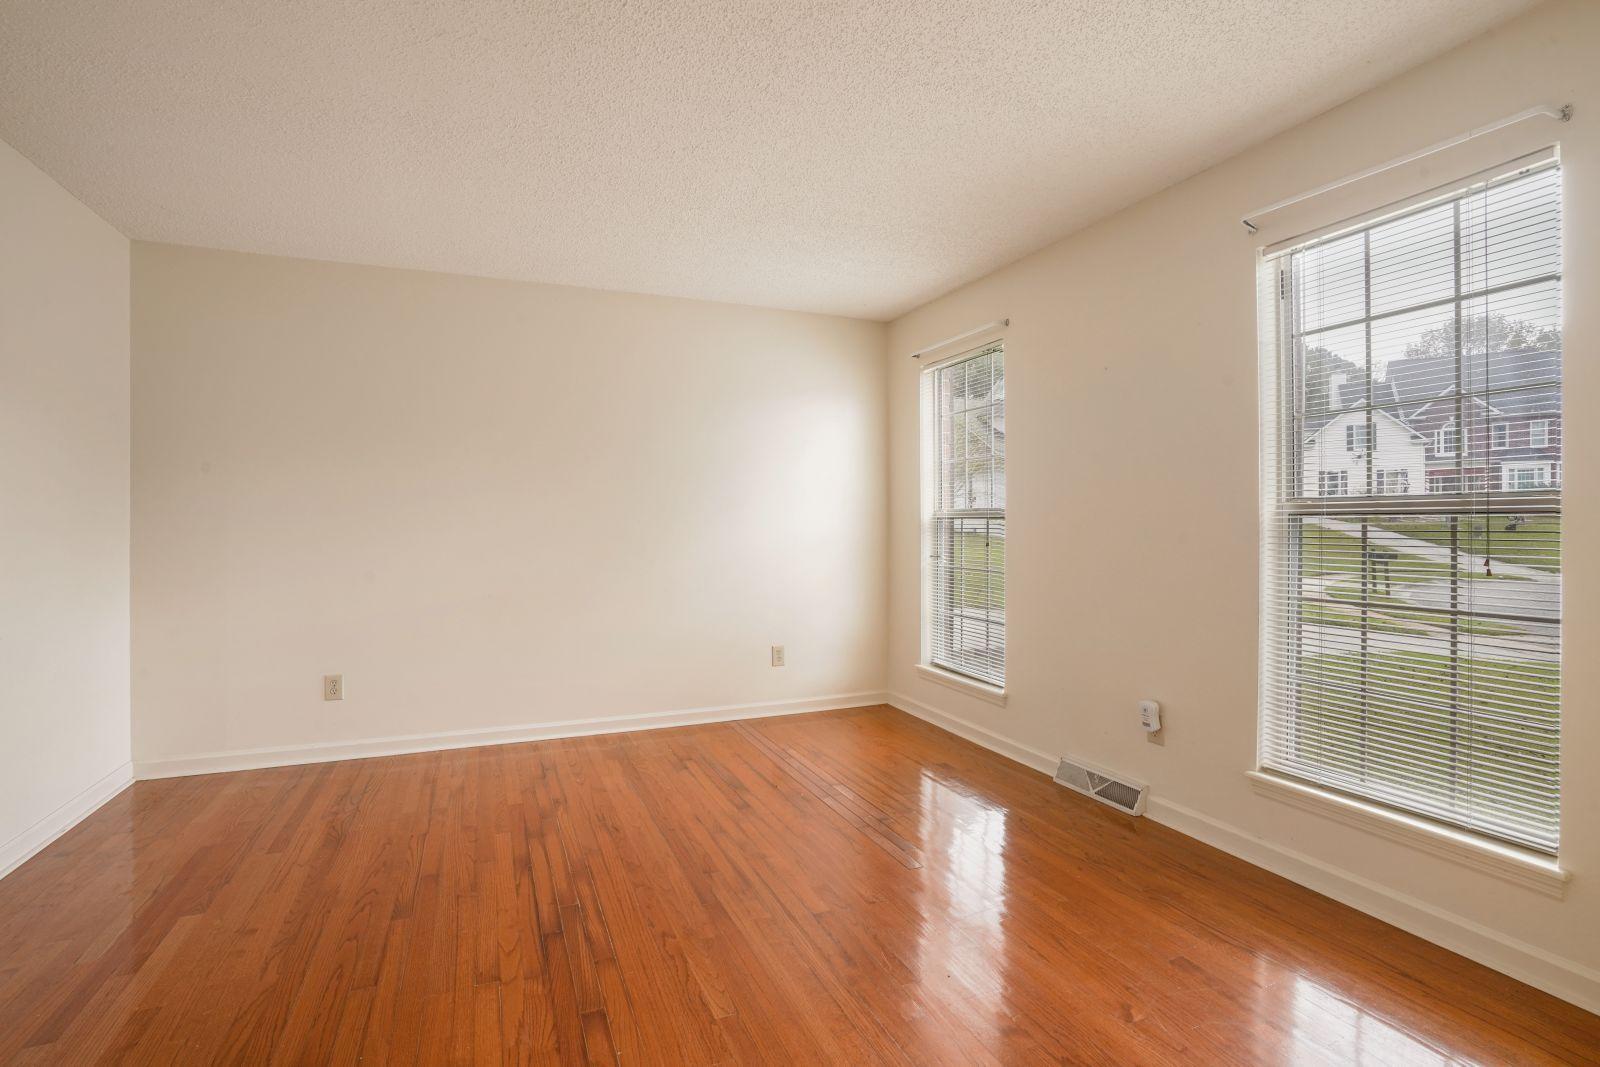 Crowfield Plantation Homes For Sale - 161 Belleplaine, Goose Creek, SC - 30